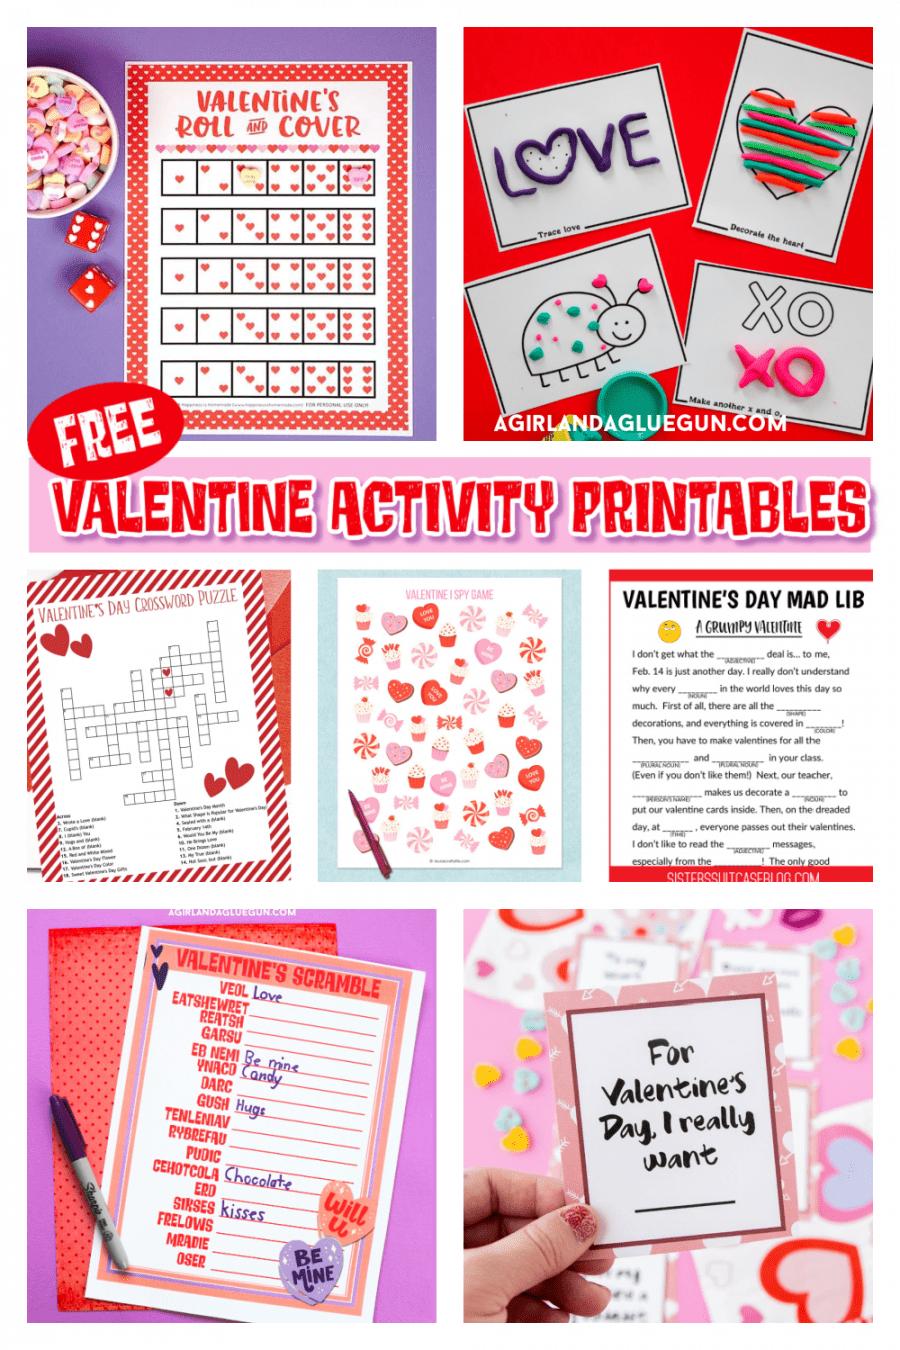 20 free Valentine activity printables